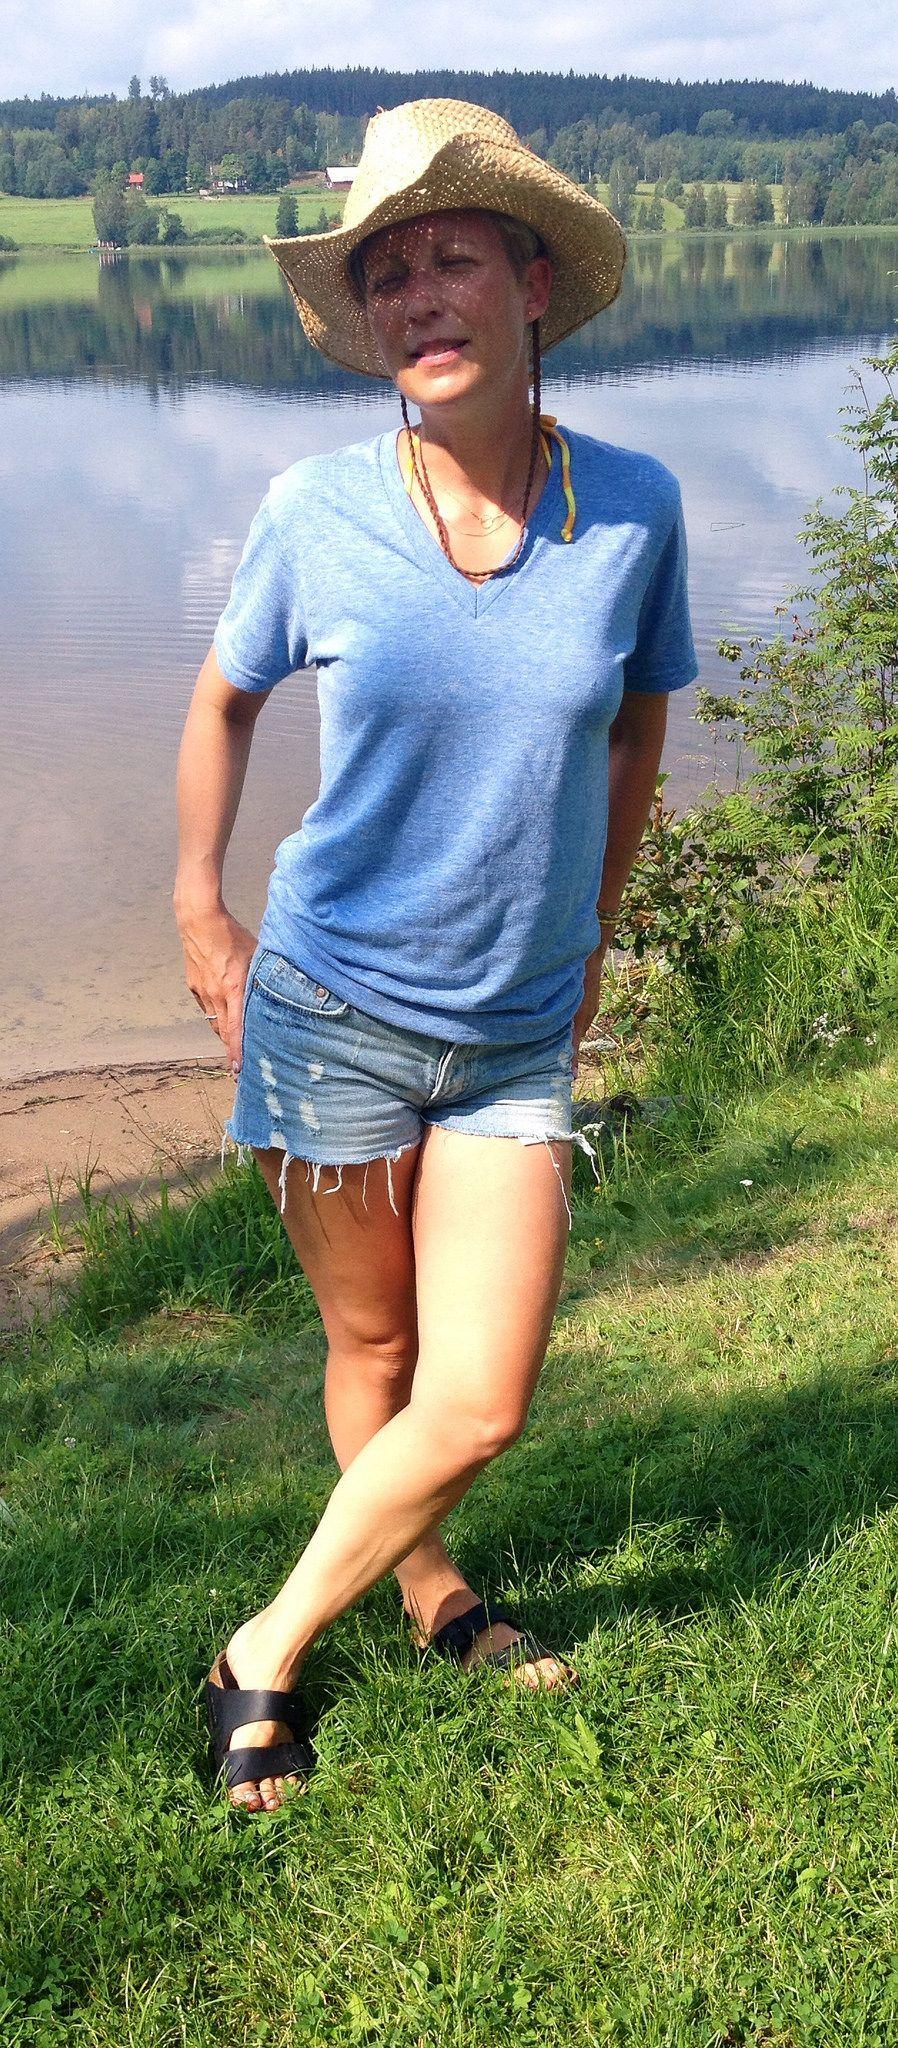 https://flic.kr/p/odjuCe | 2014-07-28 | Bikini Åhléns (jag bor i den ;D), jeansshorts H&M, blå t-shirt American Apparel, svart tofflor Birkenstock